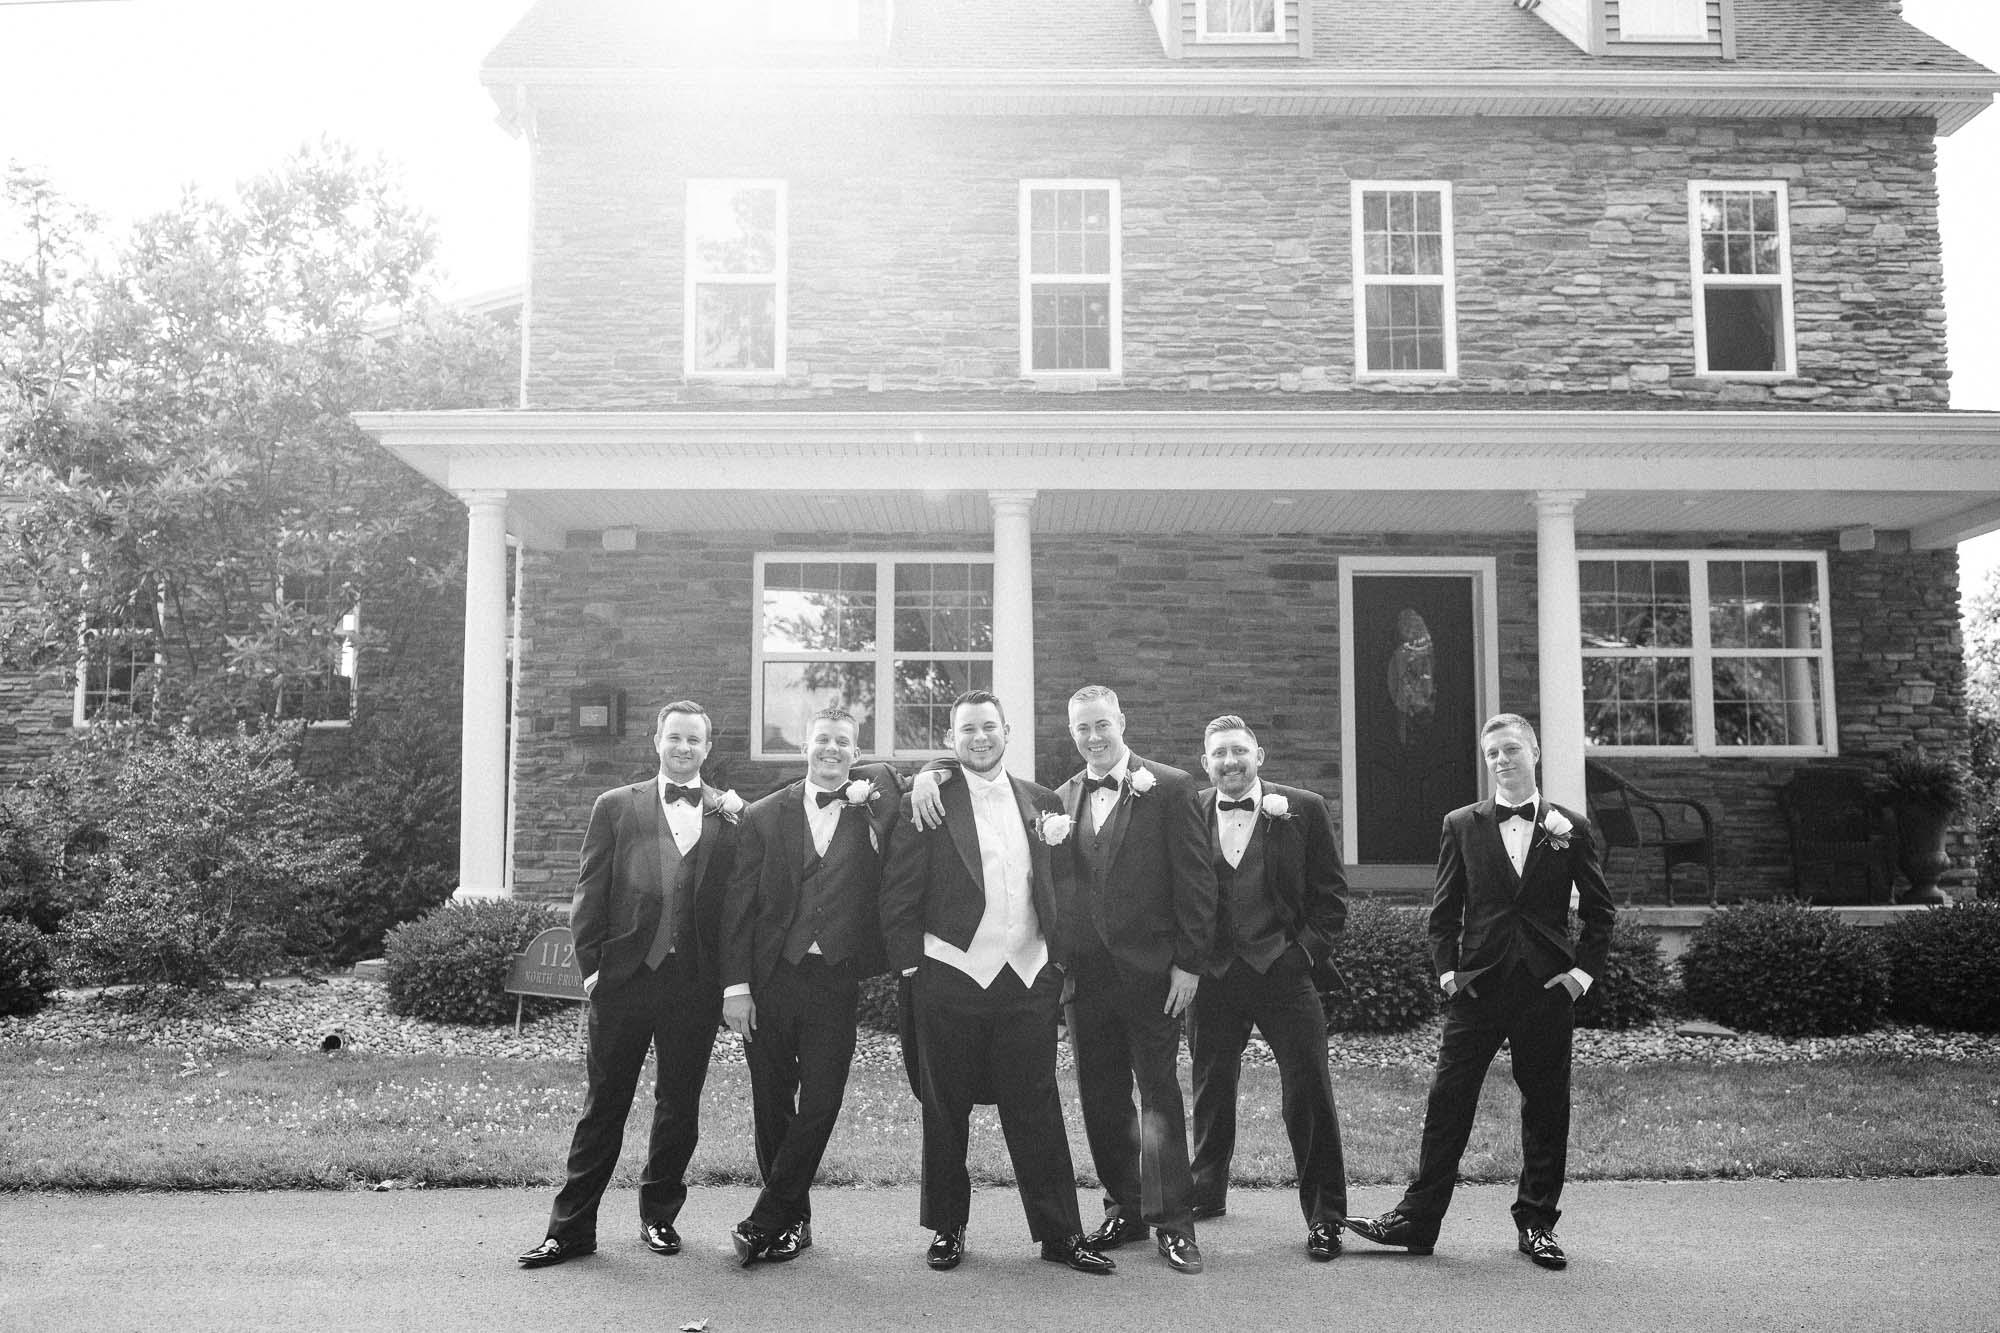 isle-of-que-wedding-6872.jpg